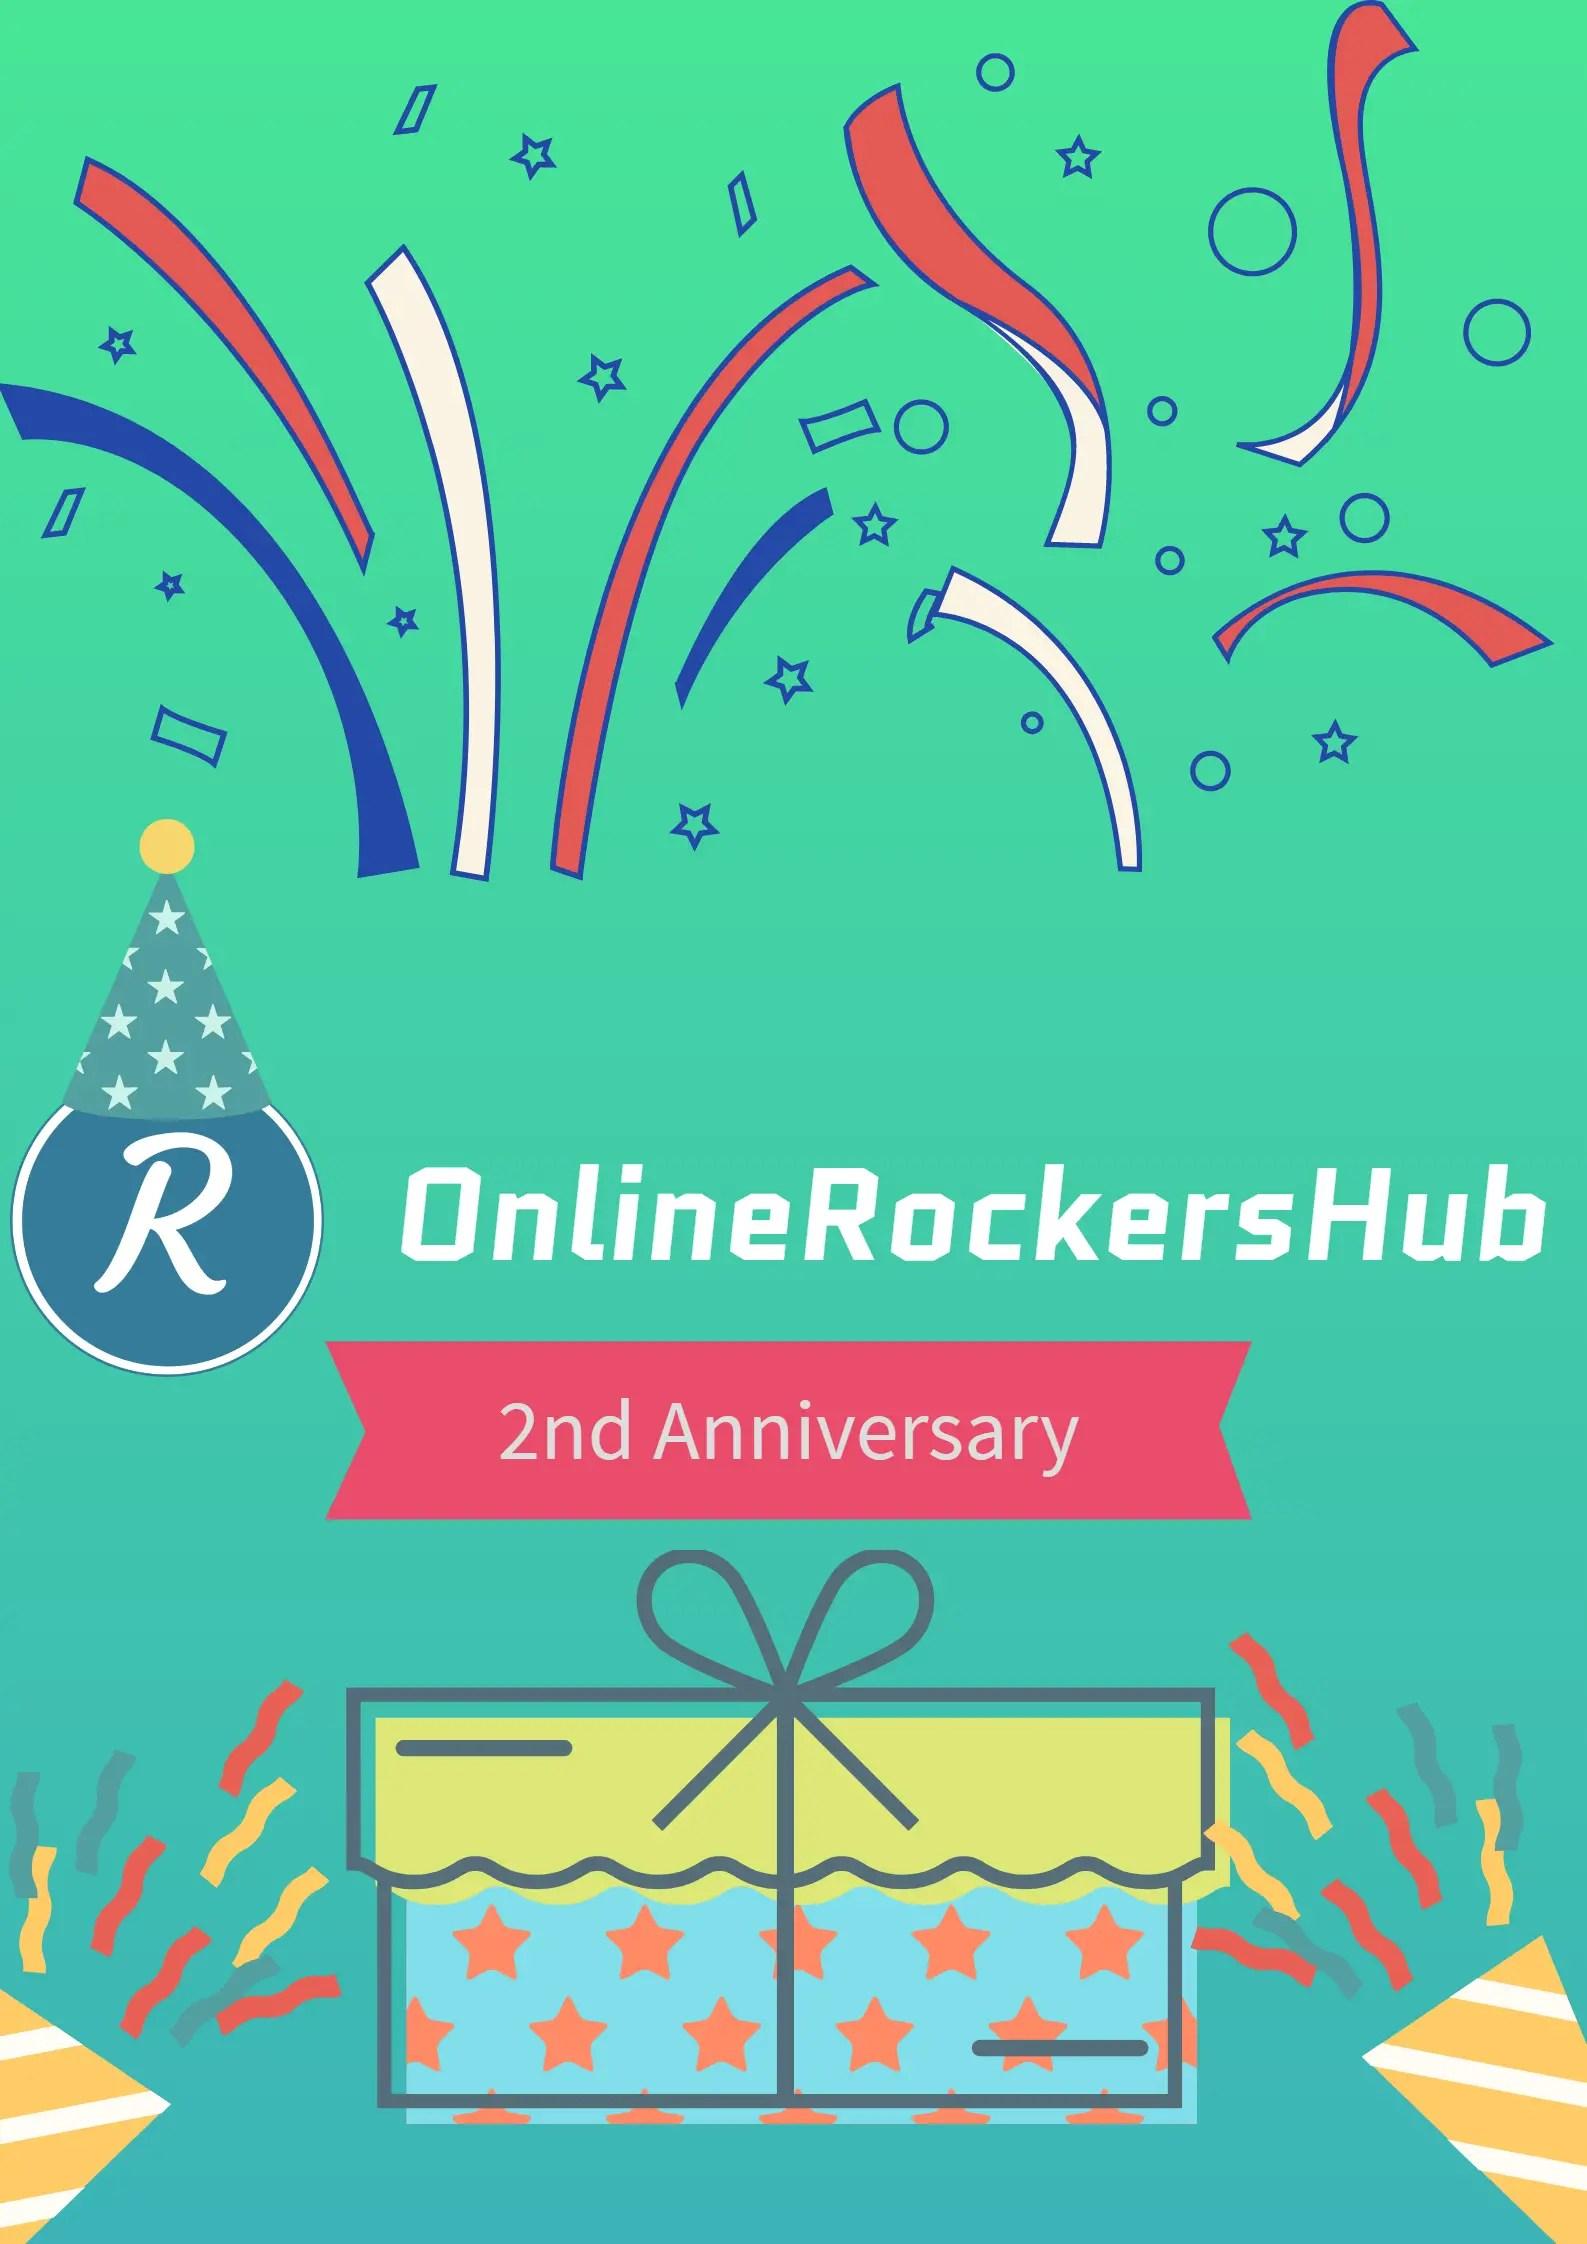 Happy 2nd Anniversary OnlineRockersHub